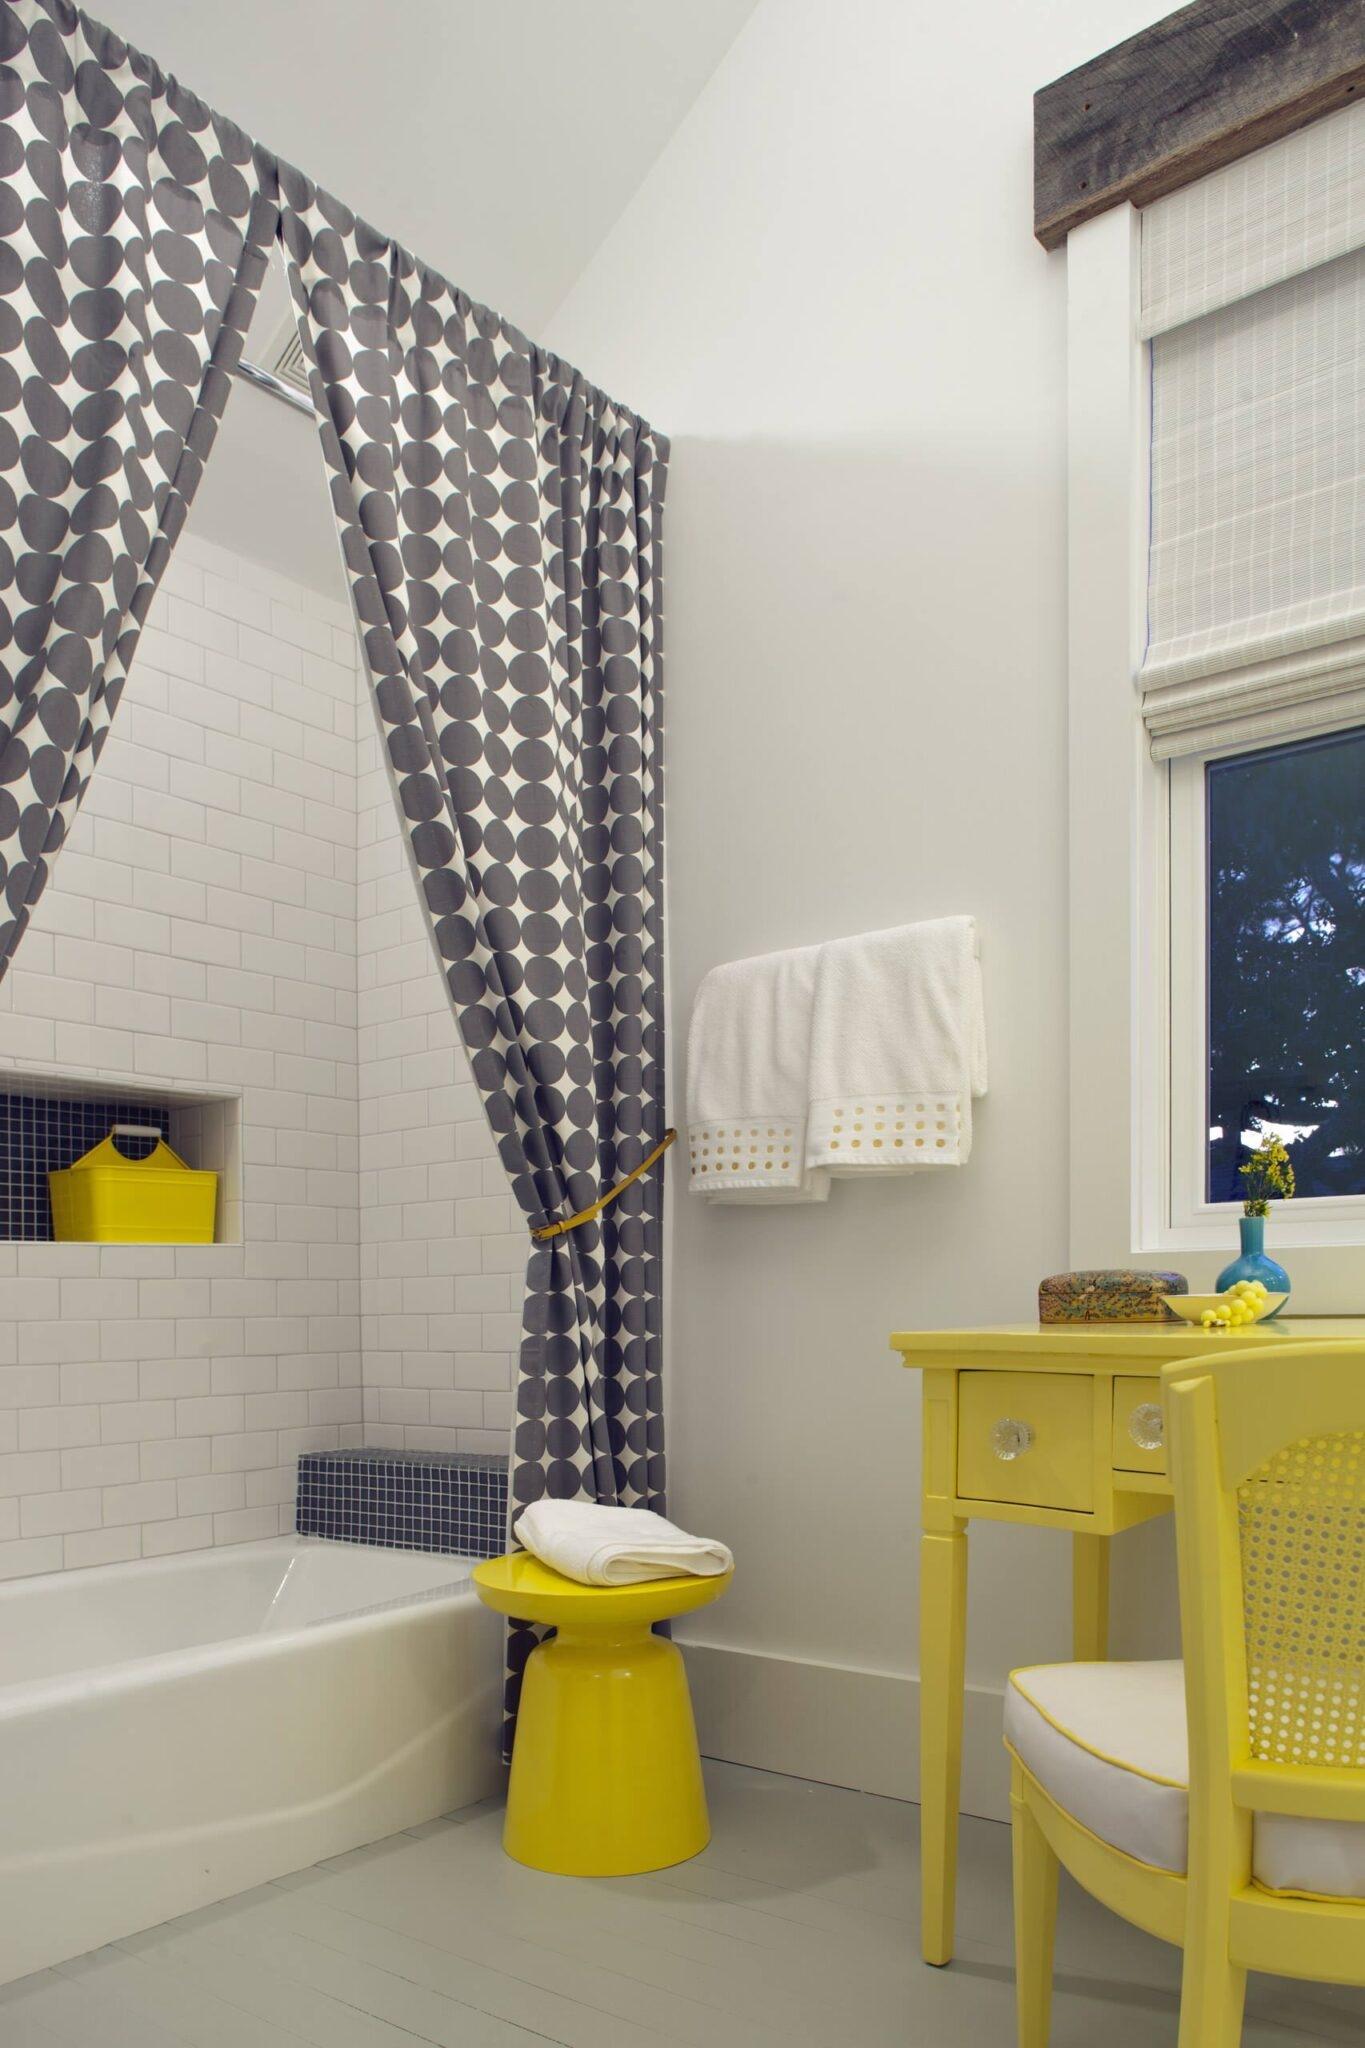 Wonderful Split Shower Curtain With Valance